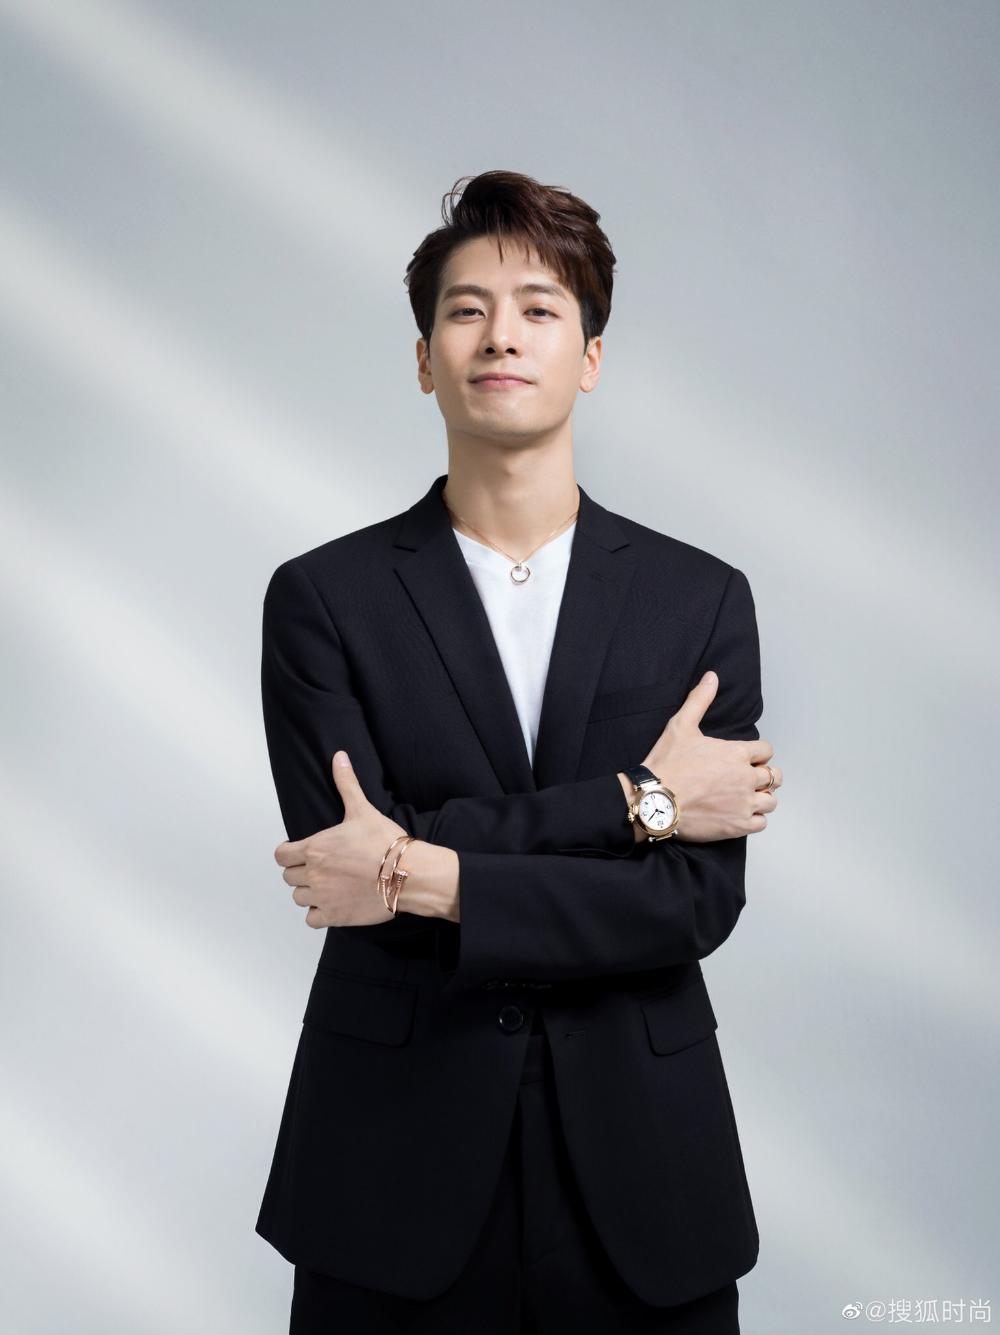 Jackson Wang Global On Twitter In 2021 Jackson Wang Got7 Jackson Jackson